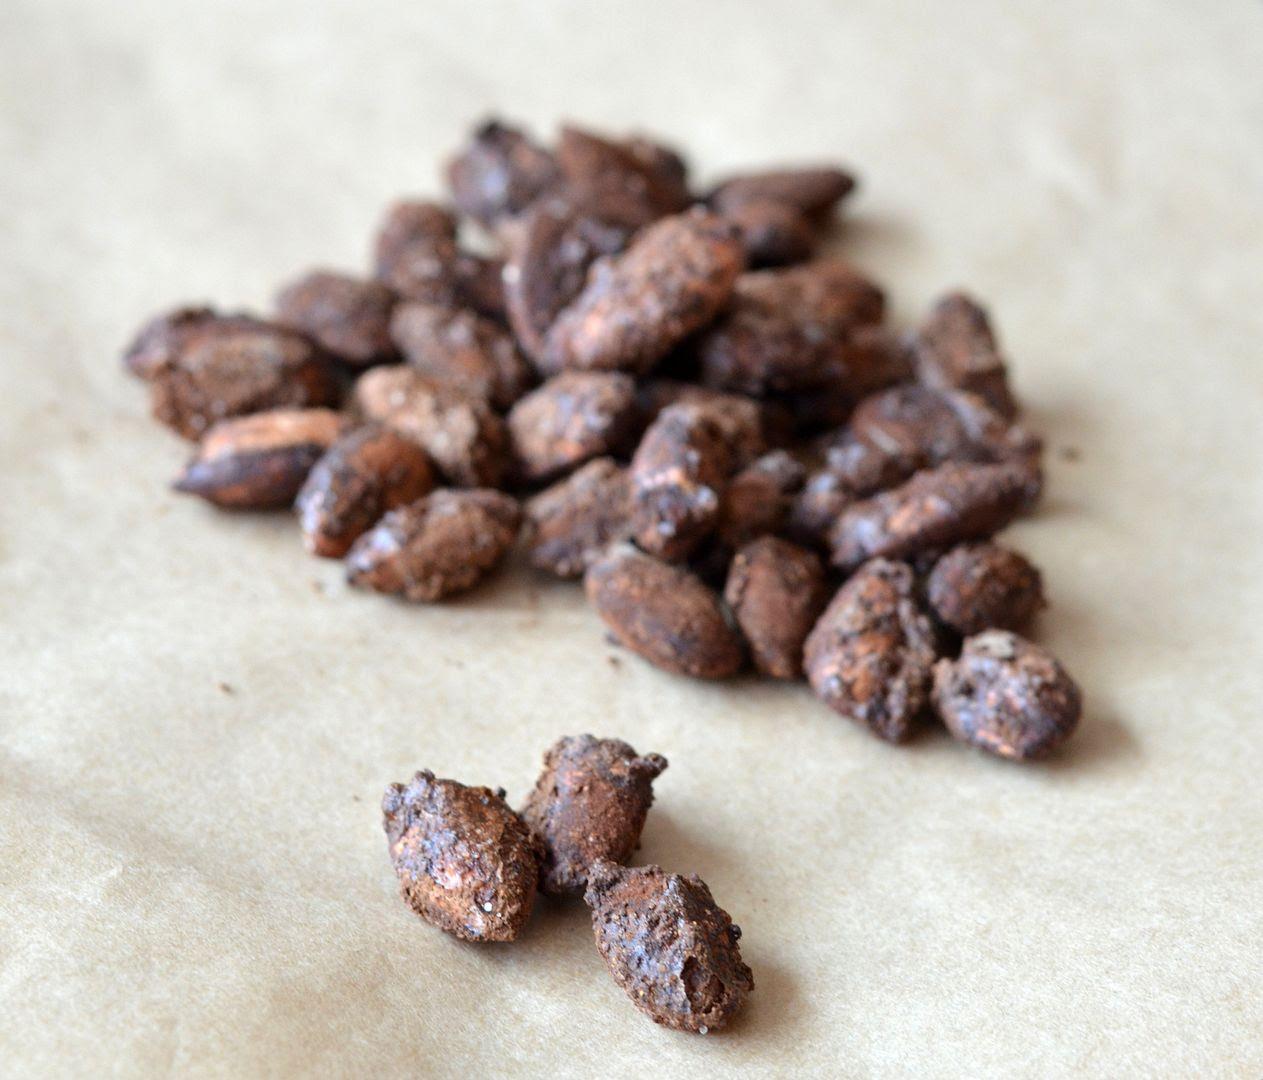 Chilli Chocolate Almonds